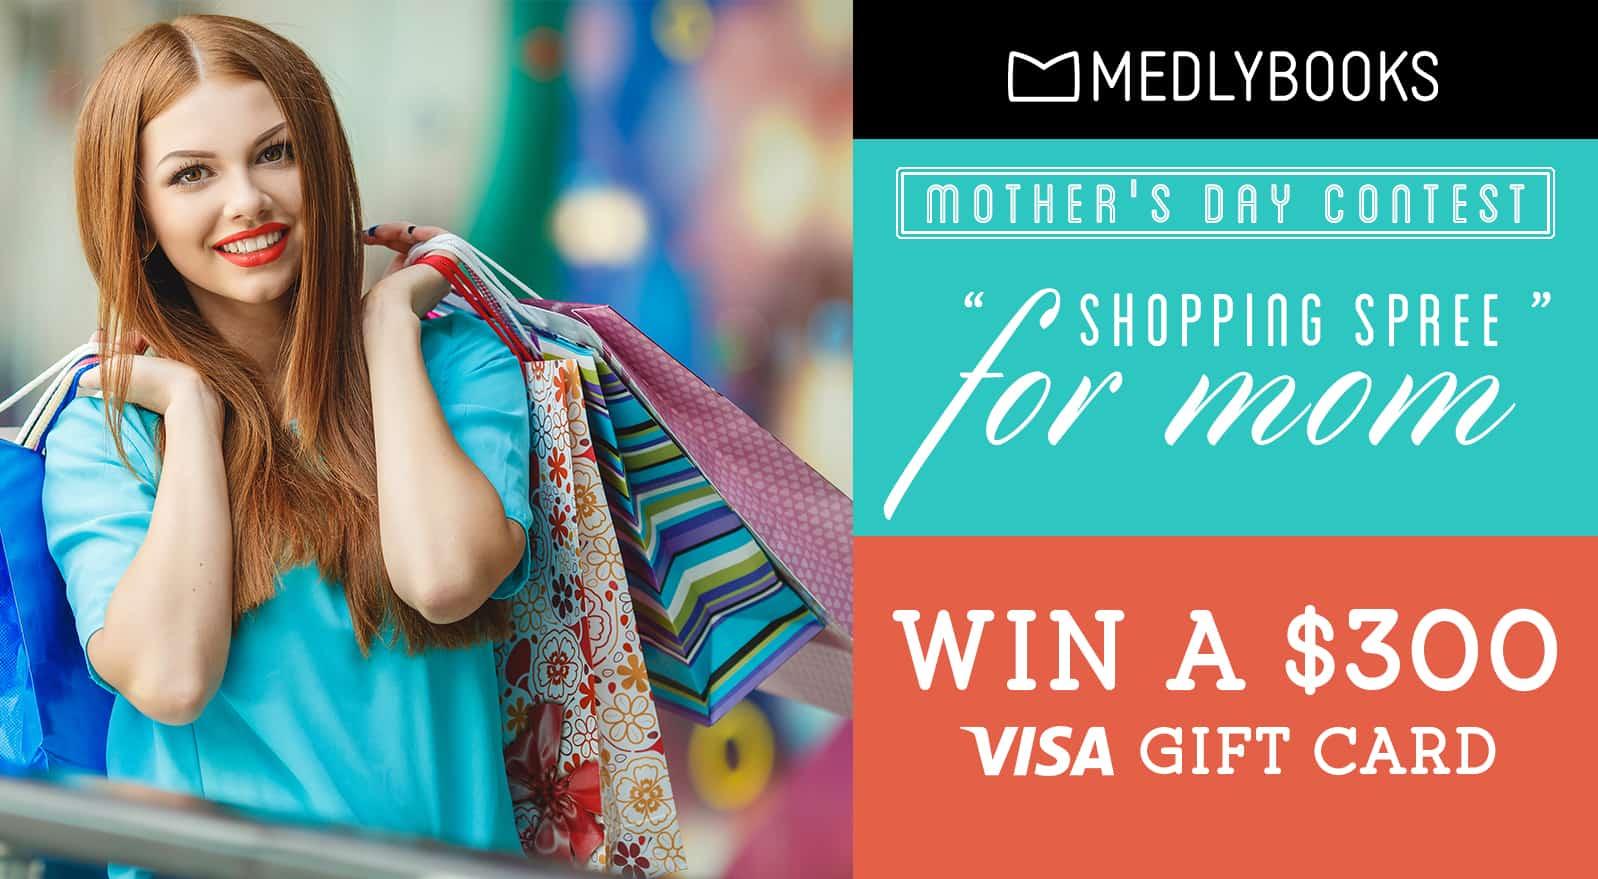 $300 Visa Gift Card giveaway!